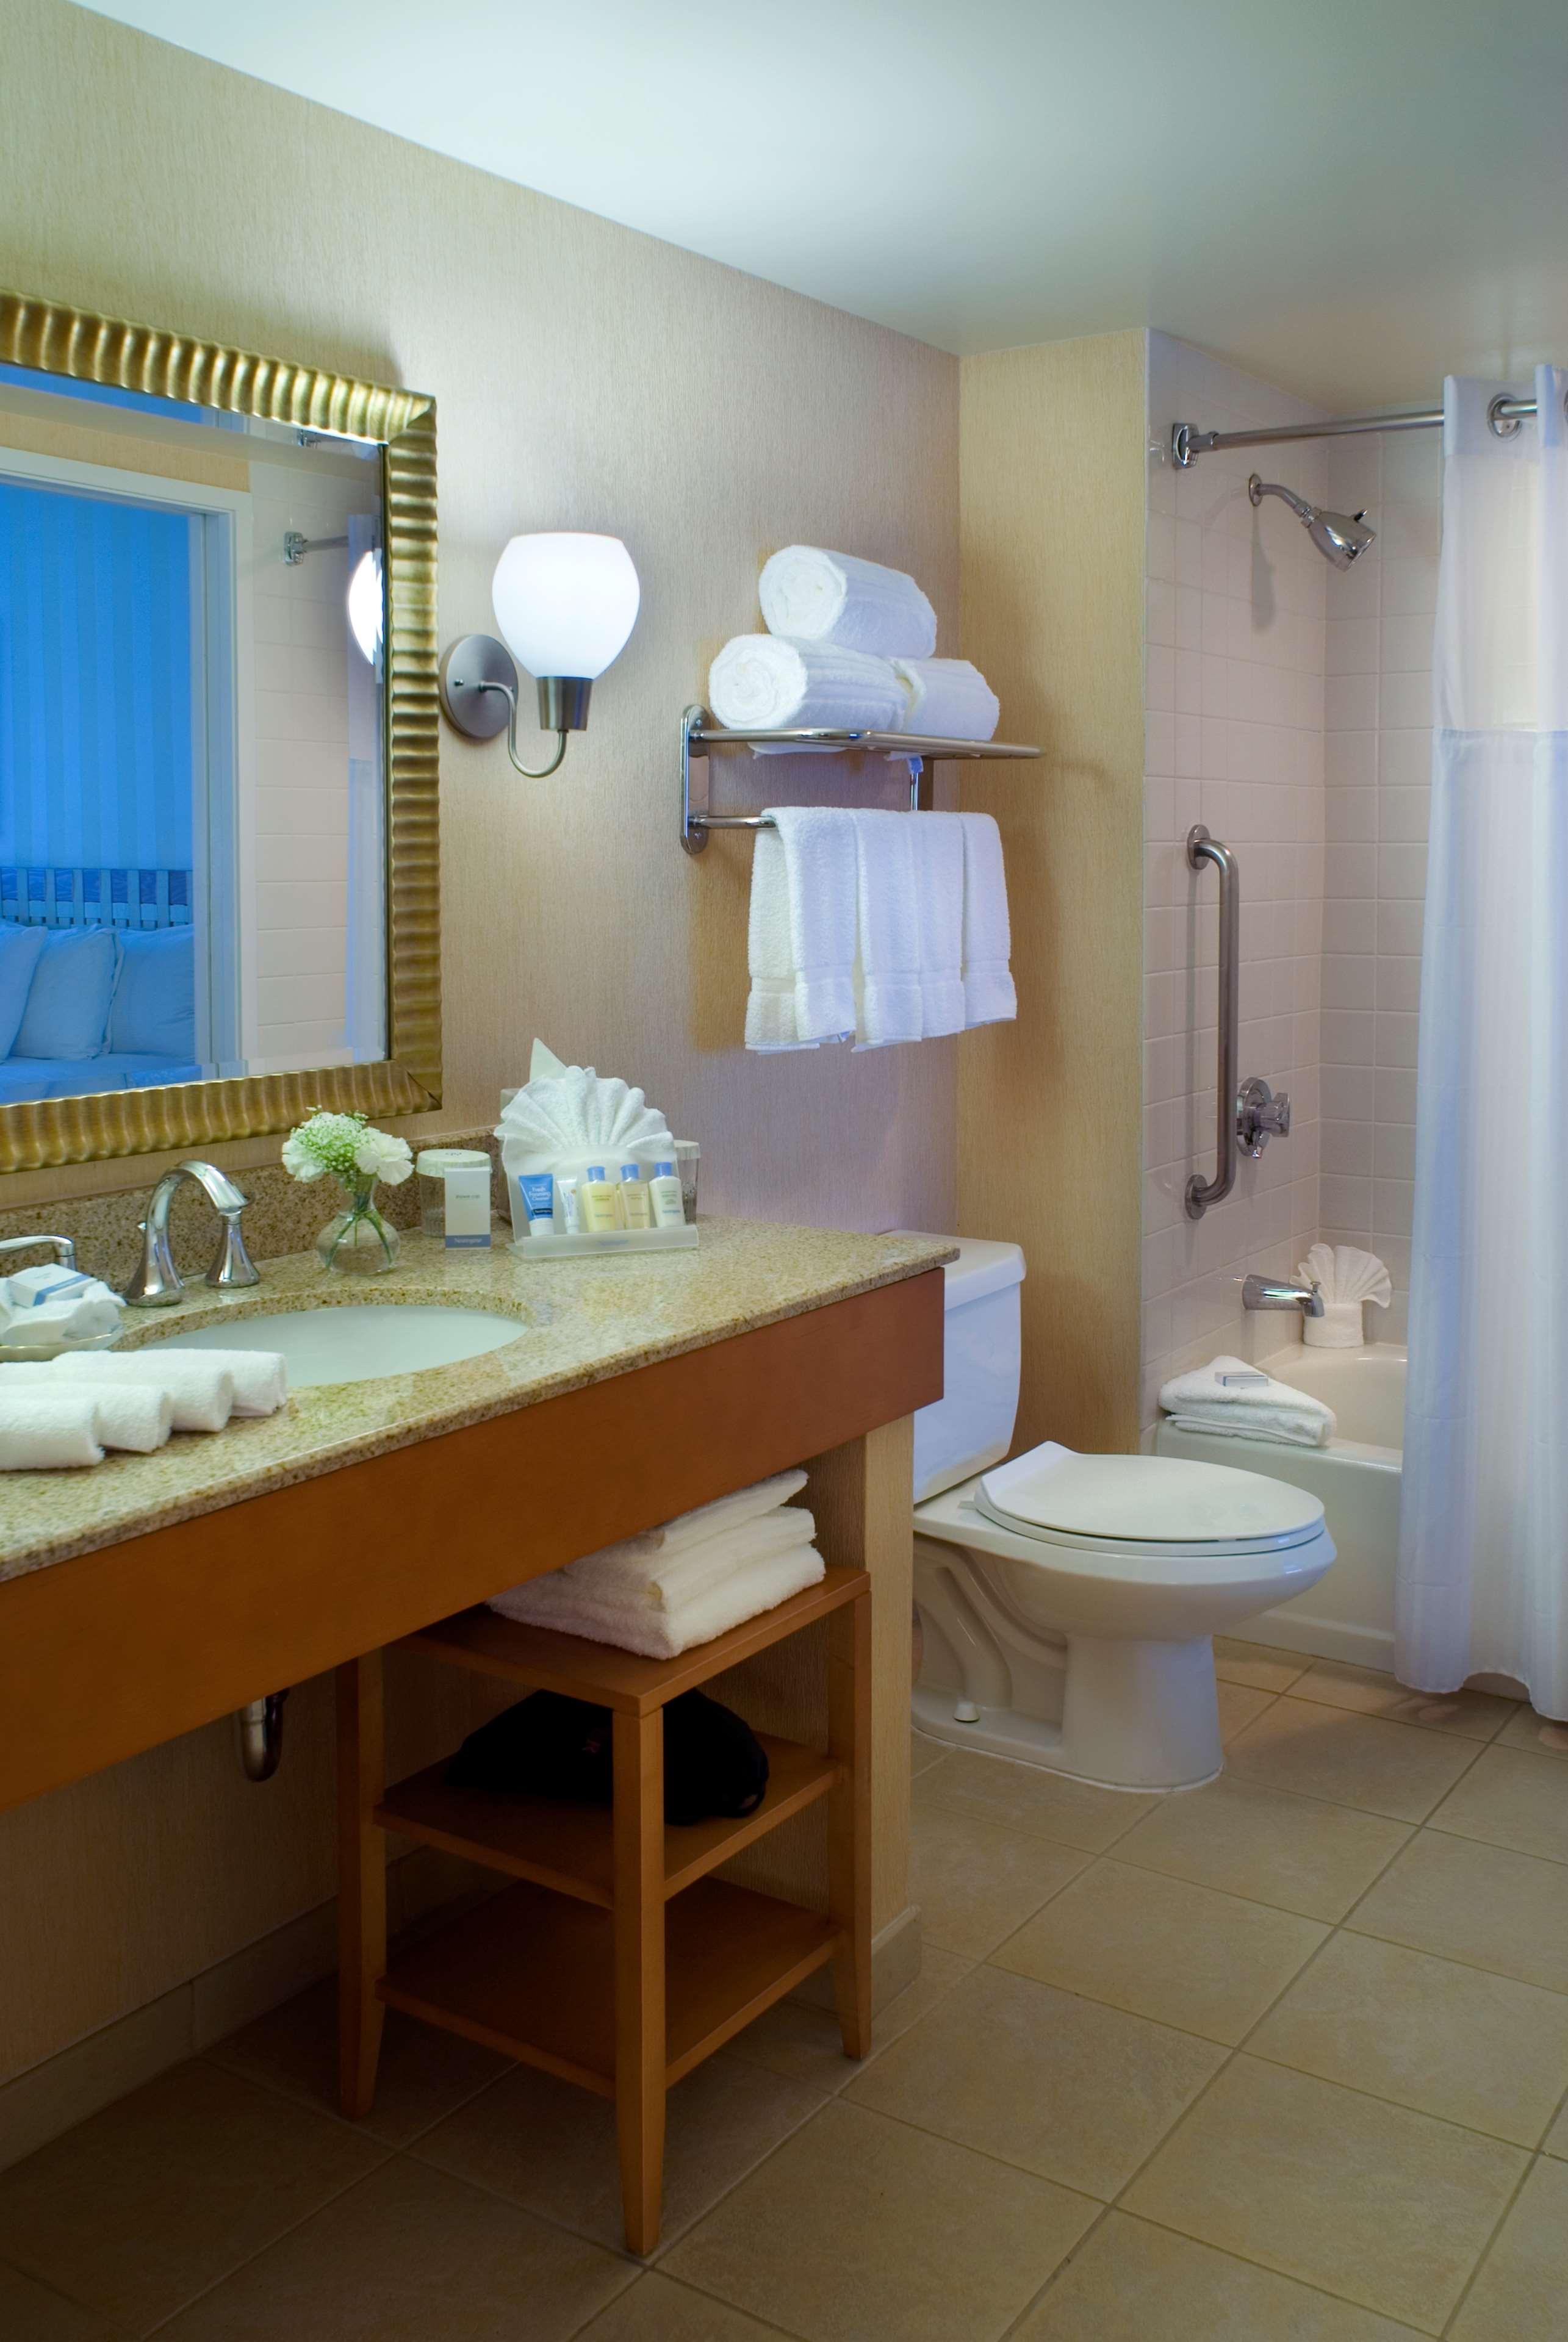 DoubleTree Suites by Hilton Hotel Santa Monica image 11